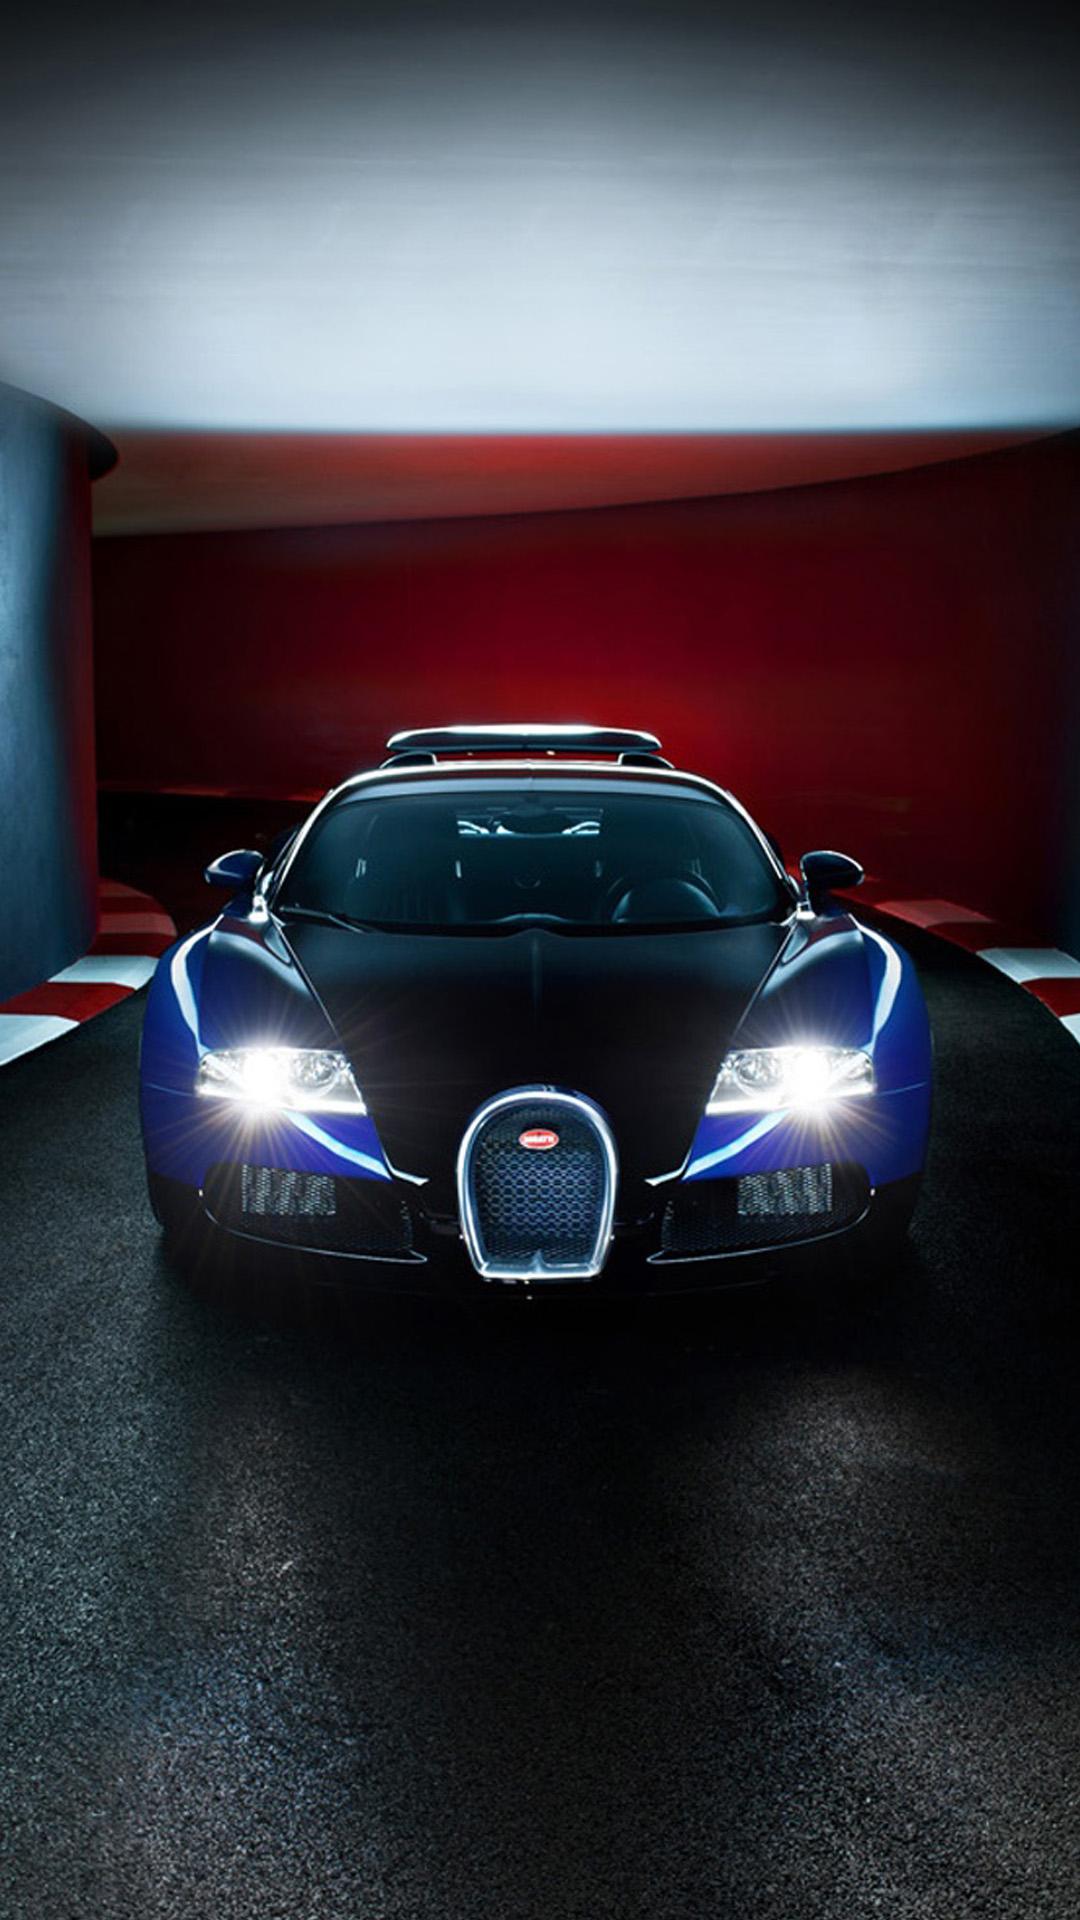 Bugatti Veyron Super Sport - Best htc one wallpapers